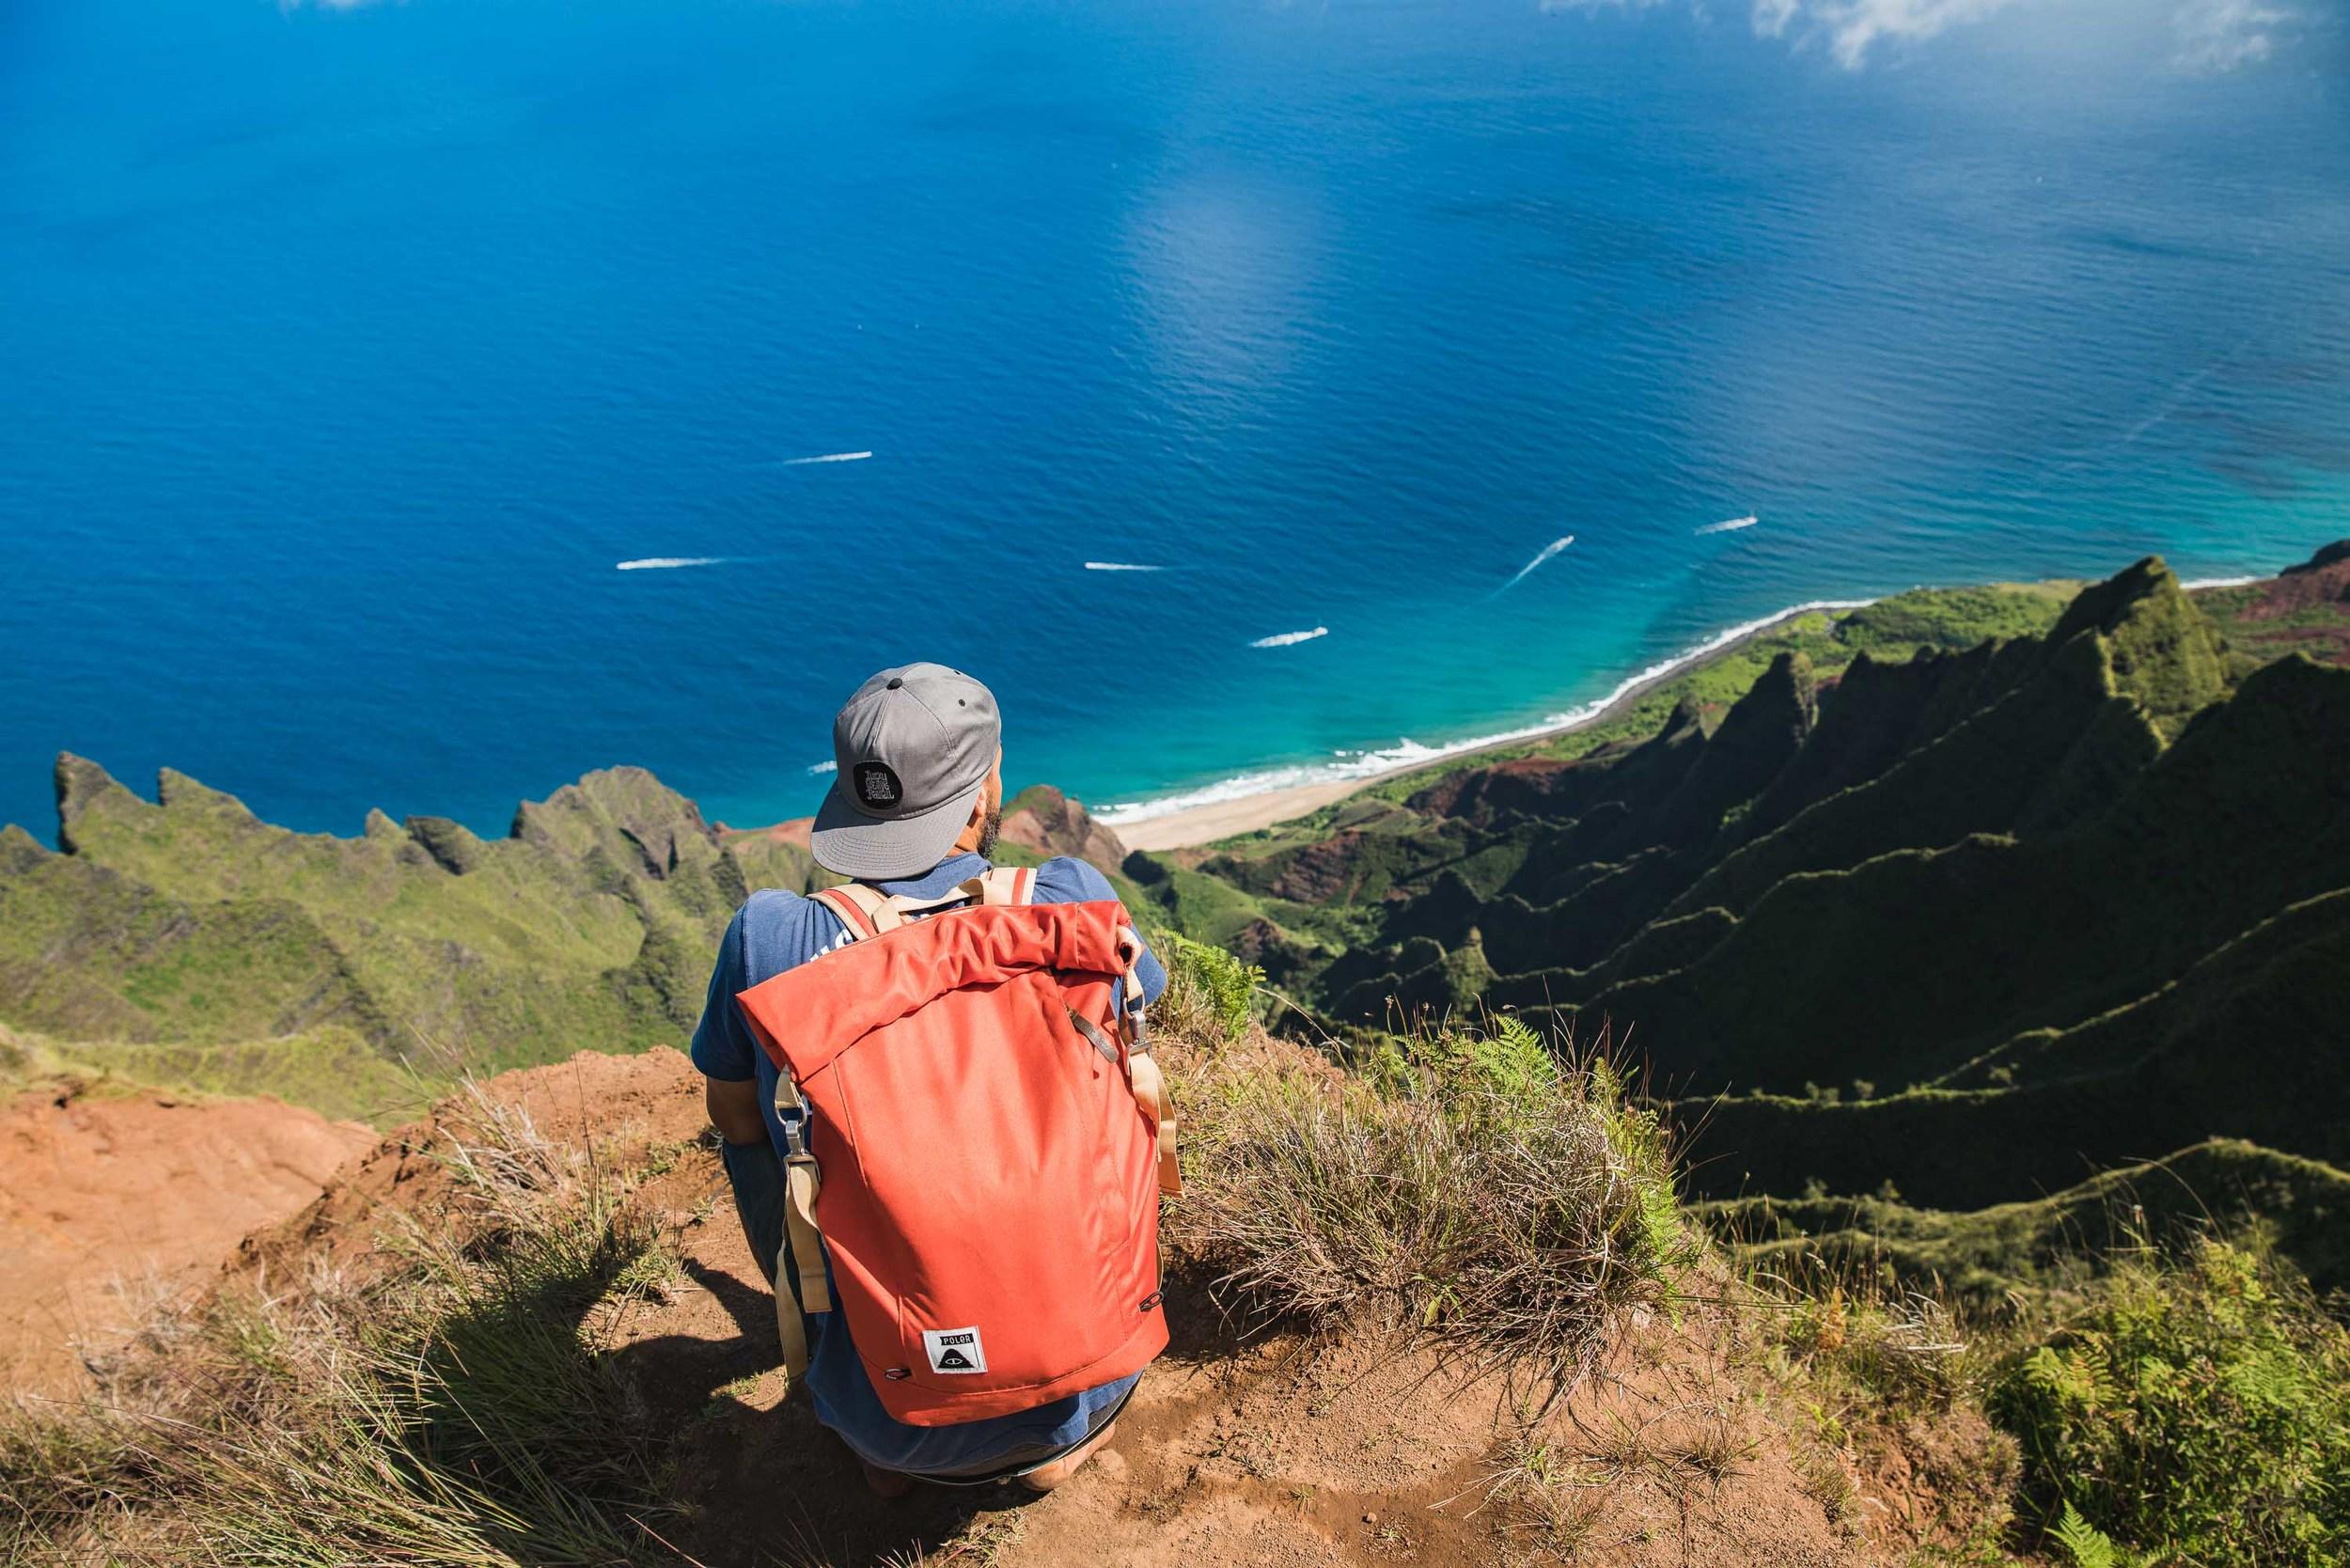 bryce-johnson-kalalau-ridge-kauai-hiking-hammock-palmwood-aloha-exchange-15.jpg